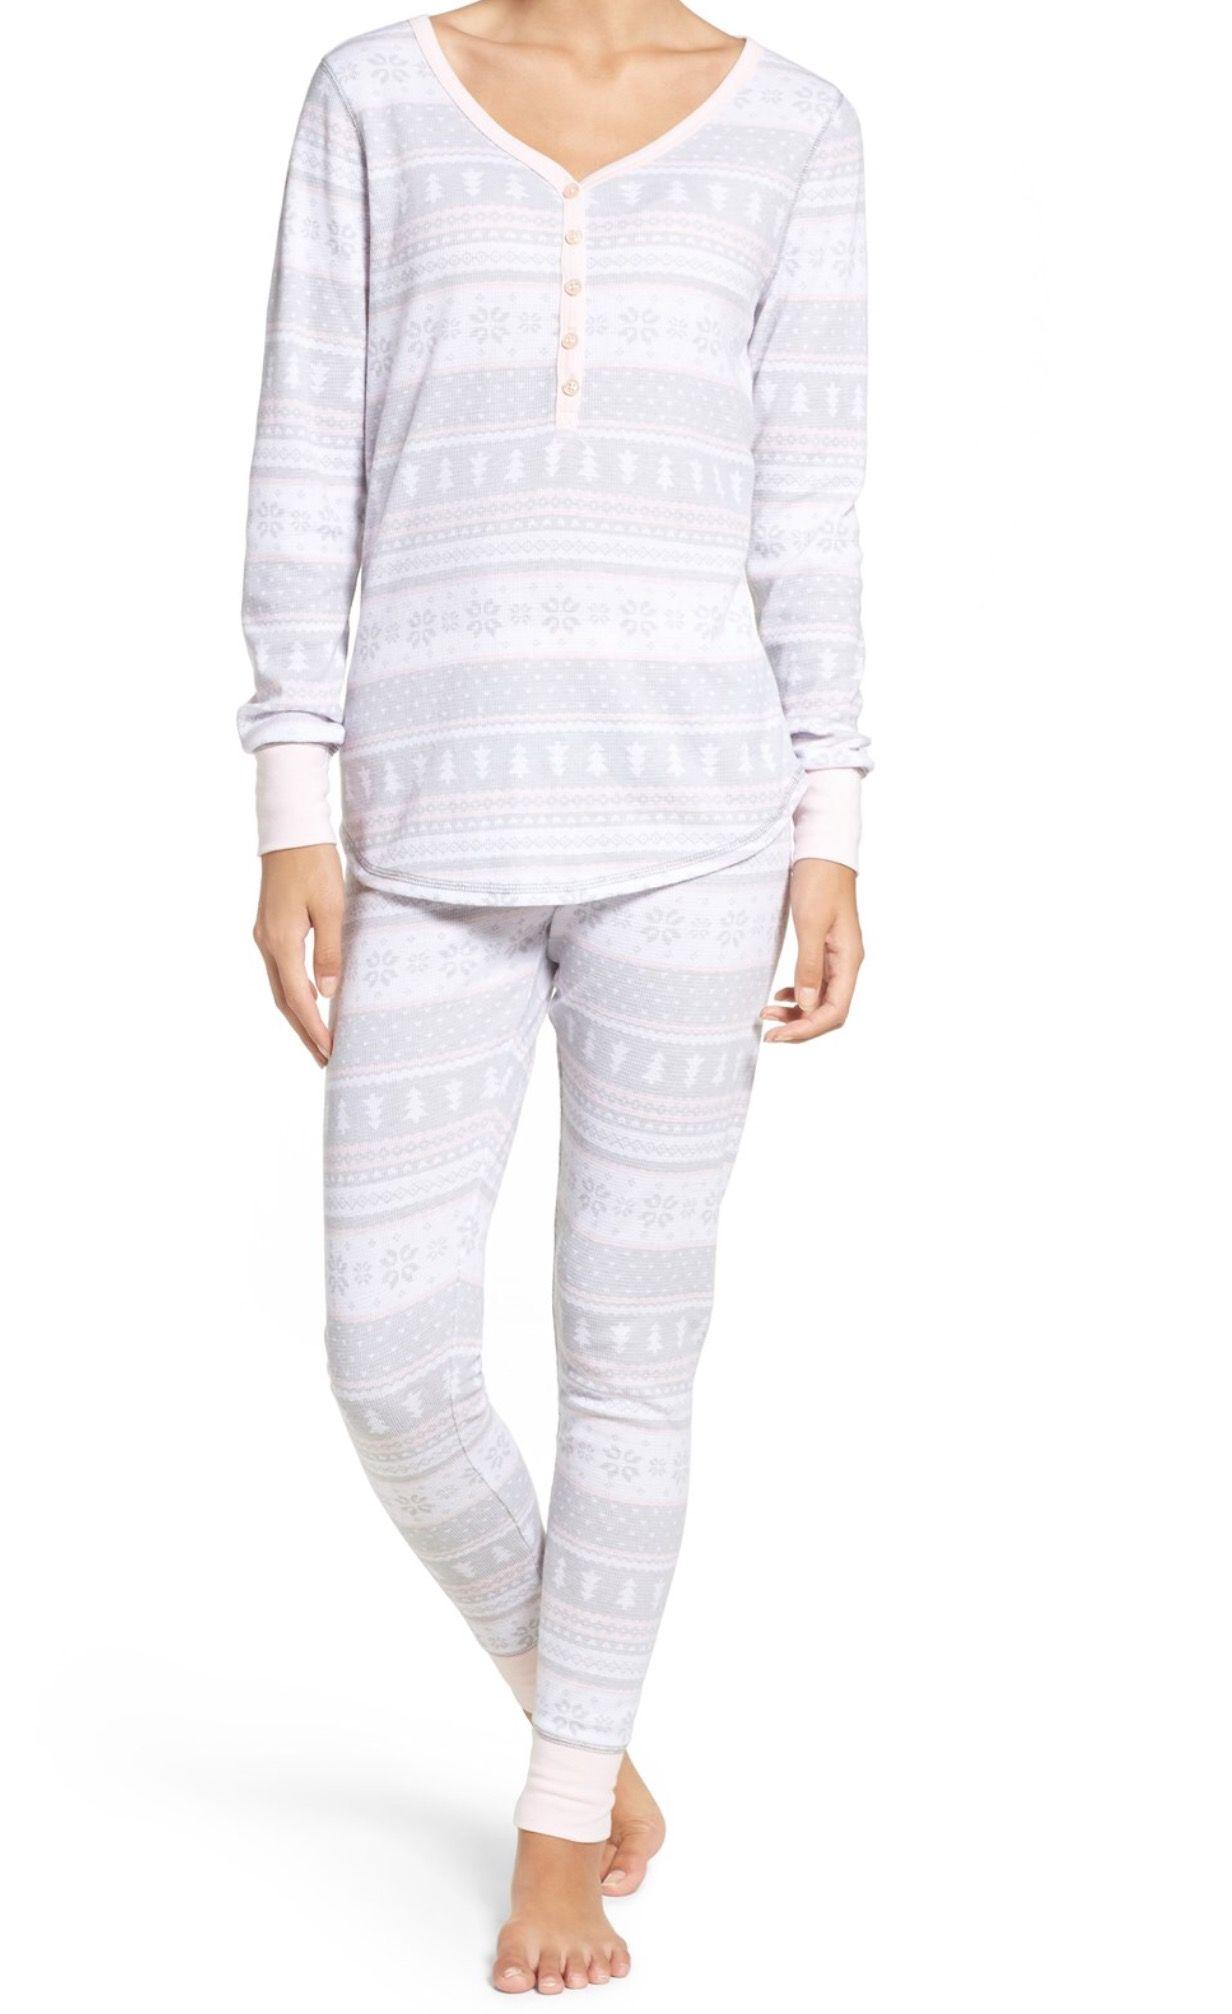 Pin by Jarae Dunn on wishlist. Thermal pajamas, Fab